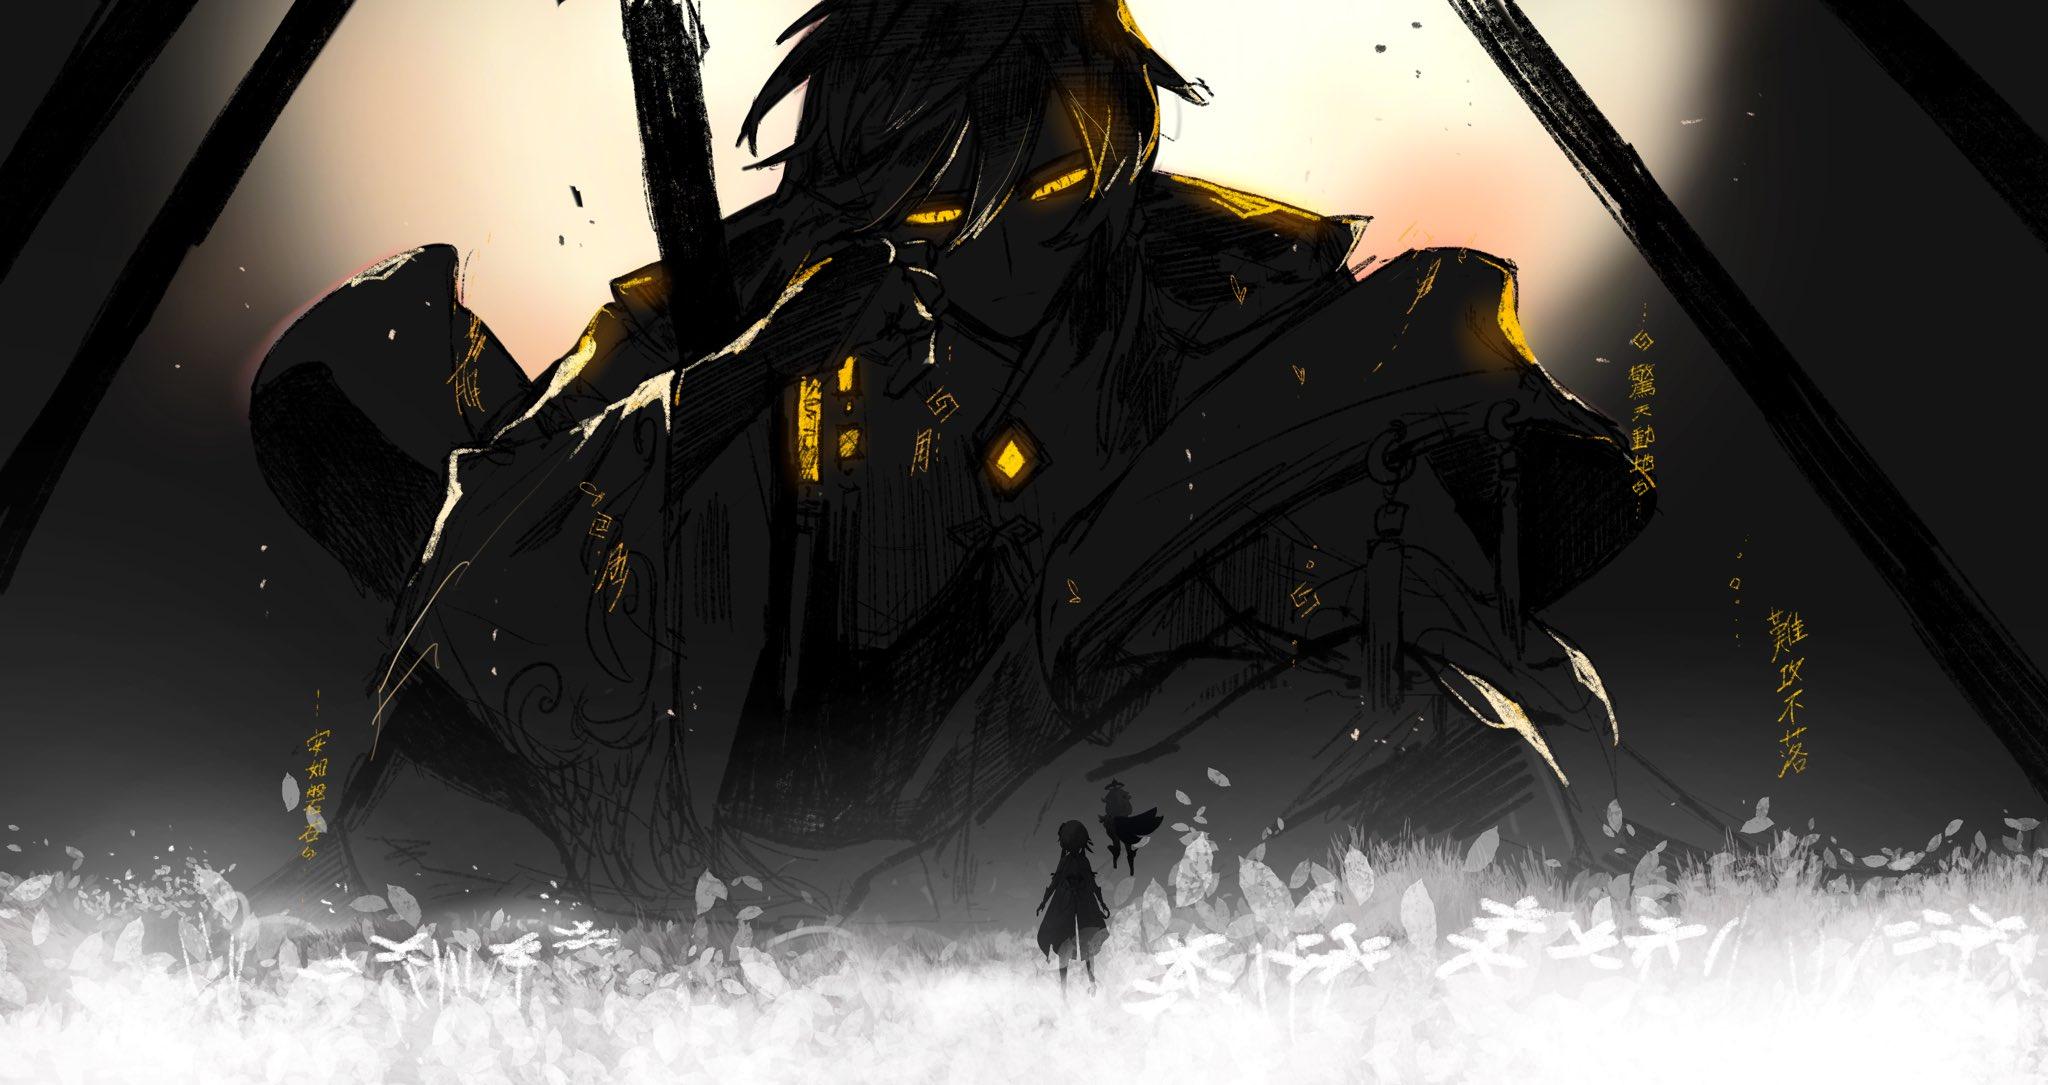 Genshin Impact Character Design Artwork Wallpaper Art Reference Photos Anime